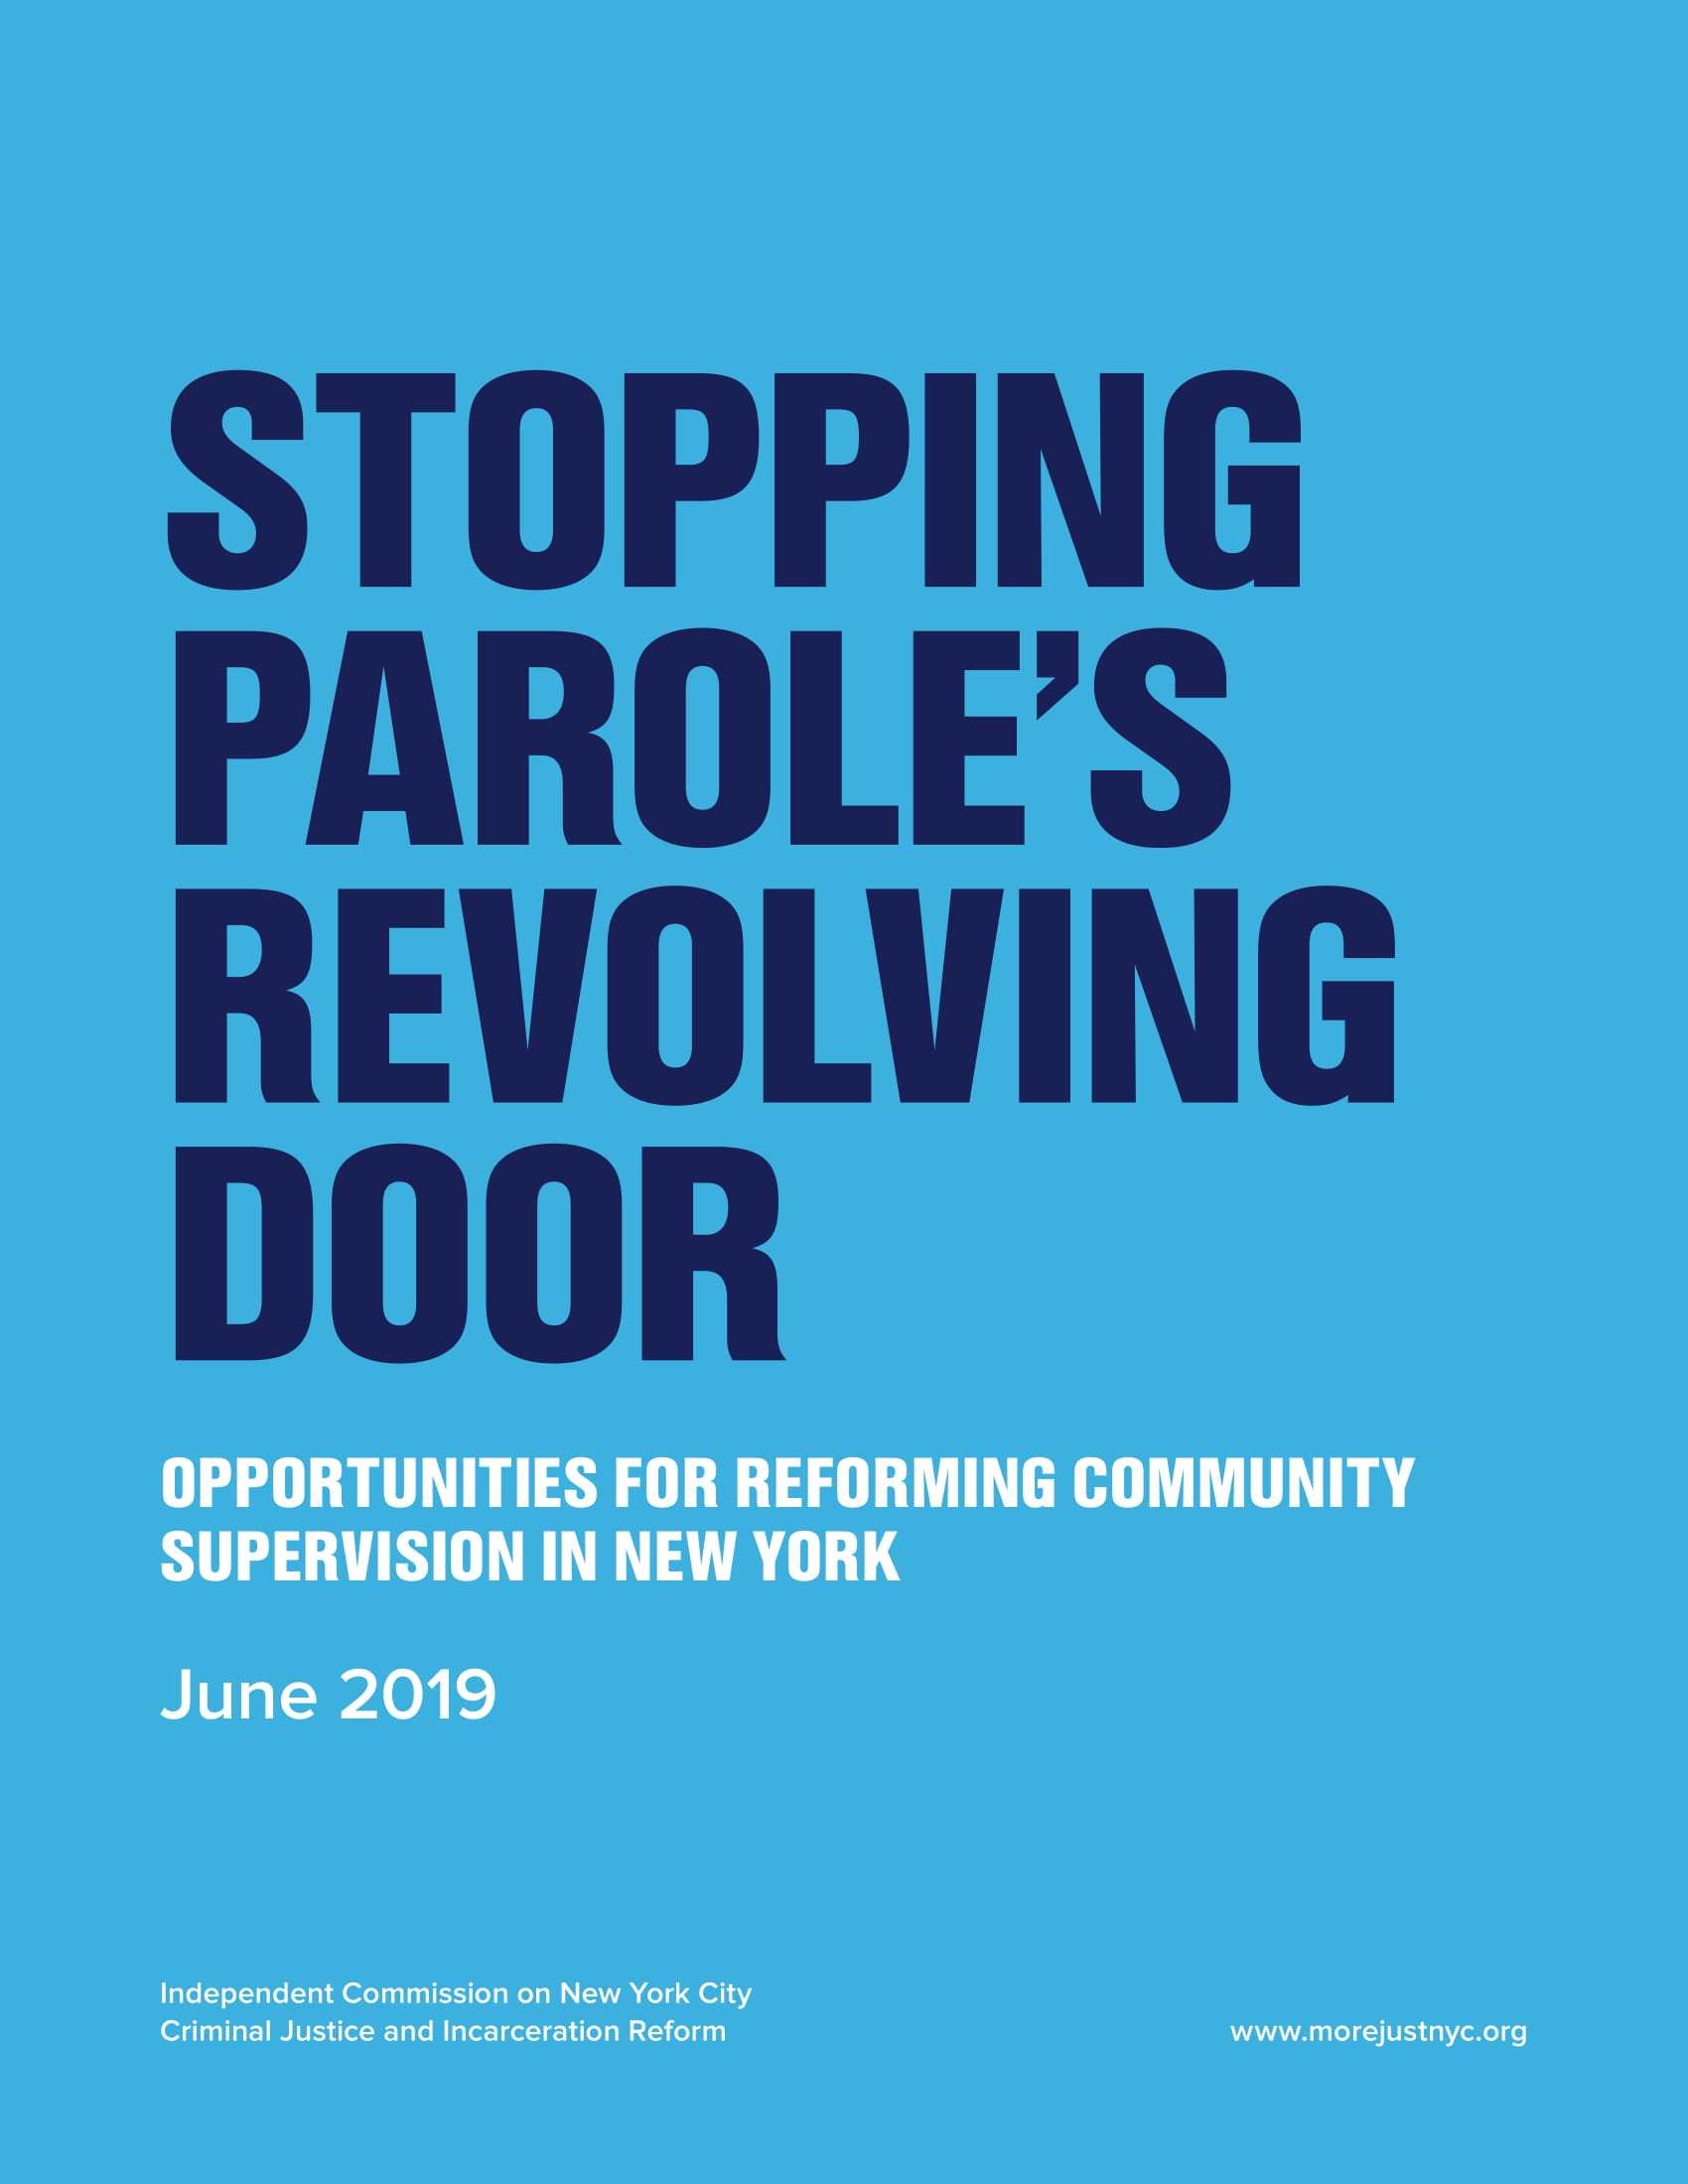 Stopping Parole's Revolving Door Cover-1.jpg